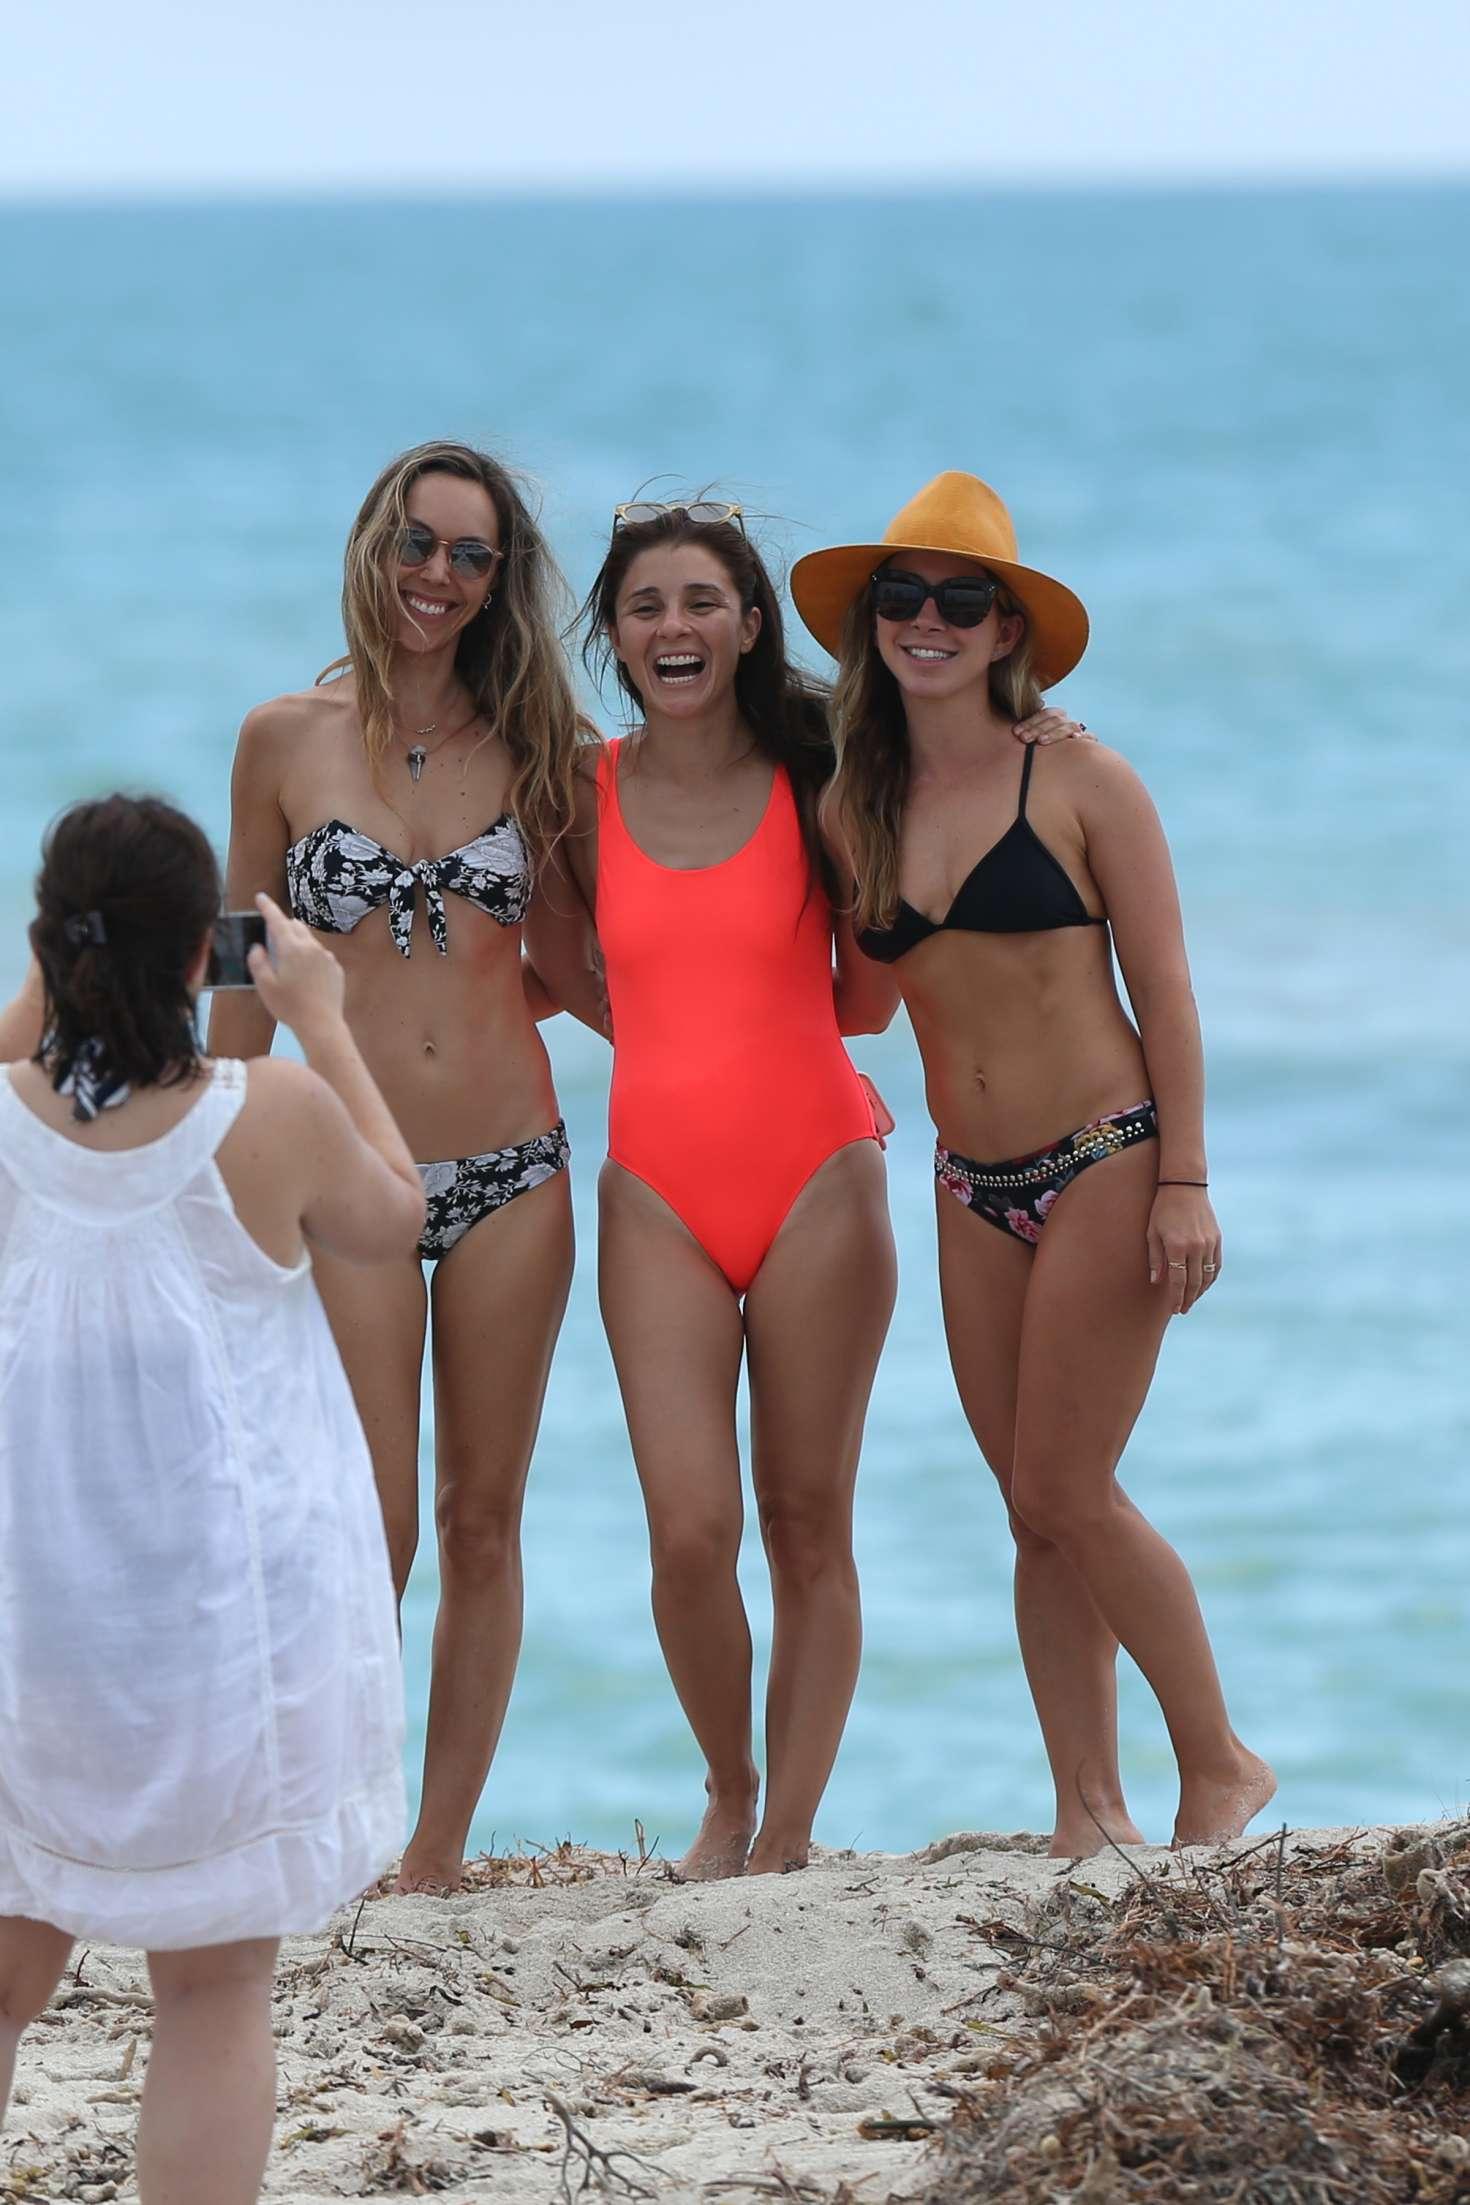 Shiri Appleby Wears A Orange One Piece Swimsuit To The